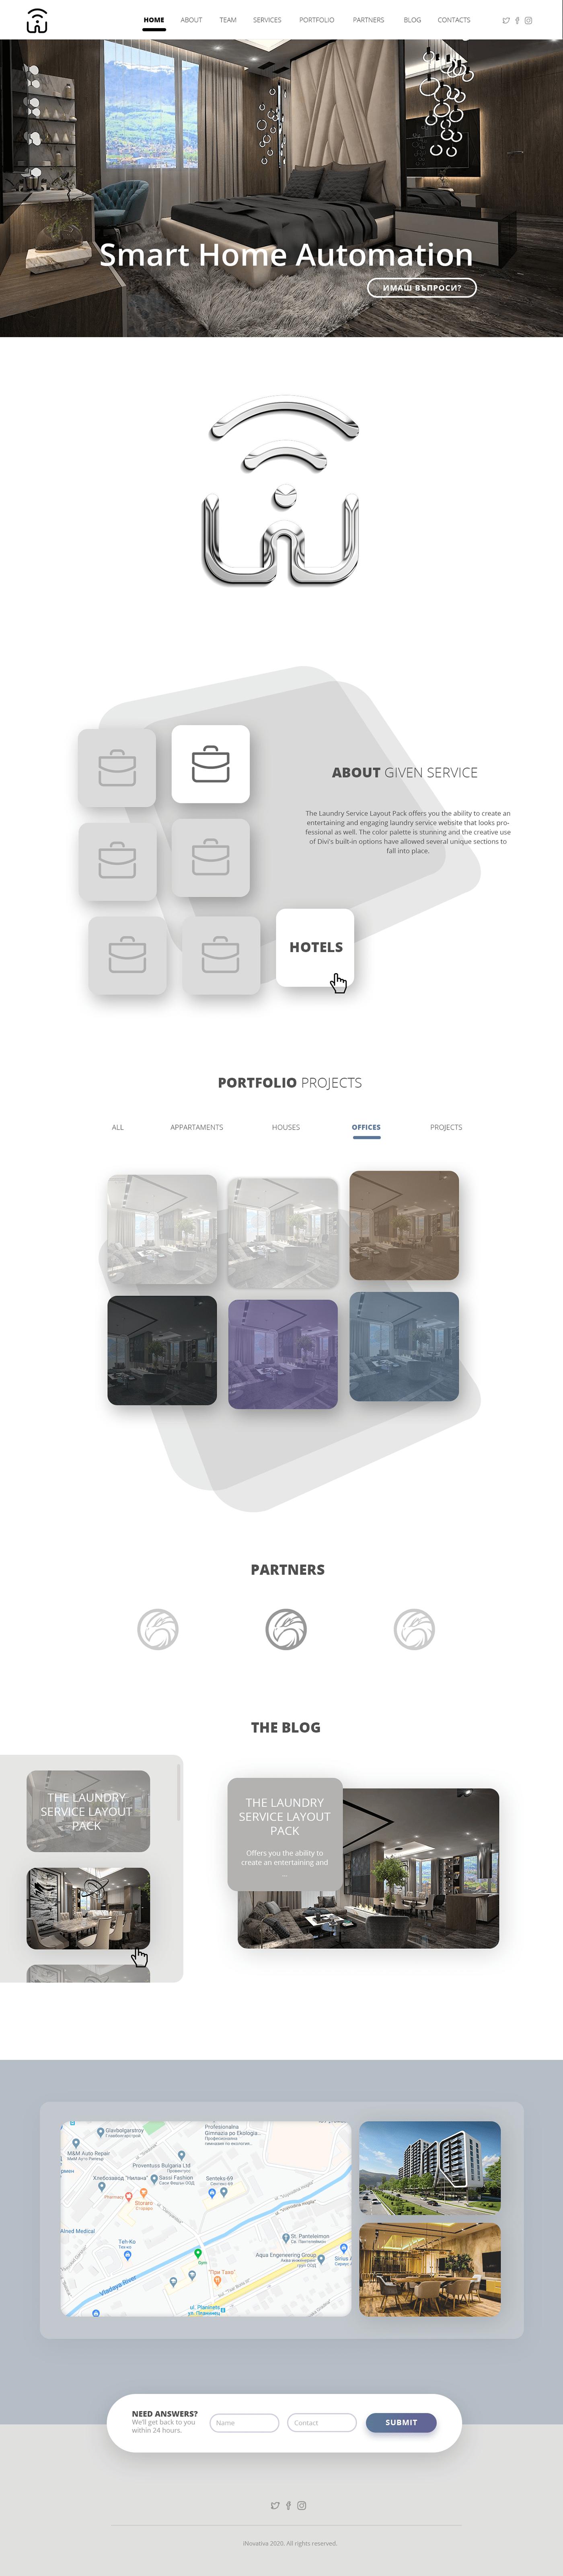 company Custom design Home Automation Website wordpress